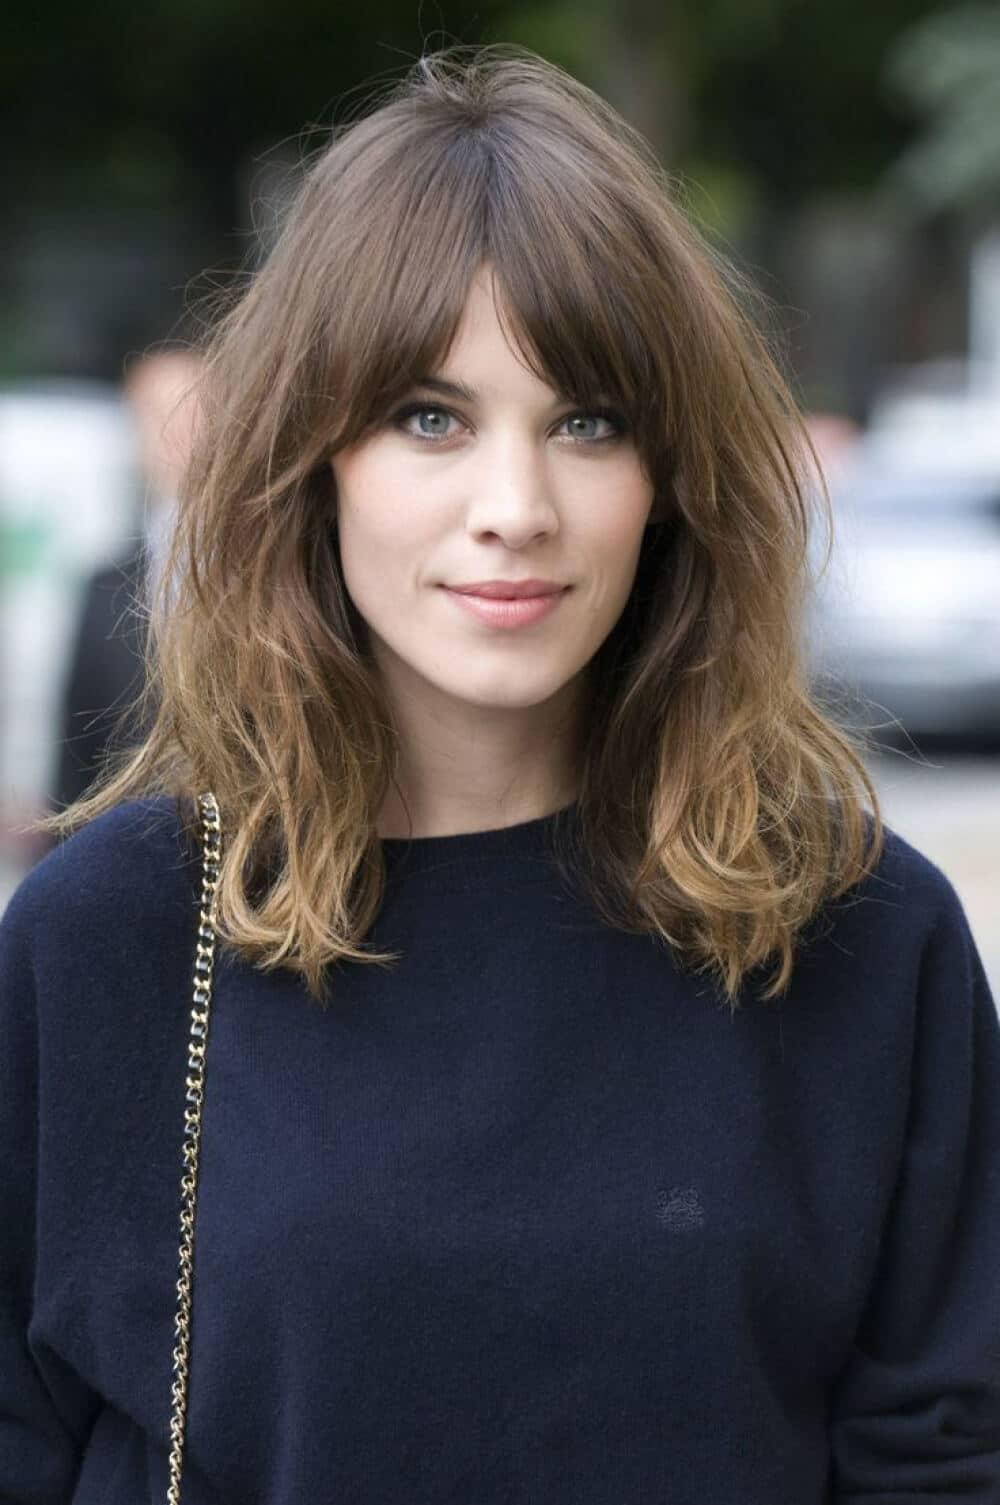 Cute Medium Hair with Bangs